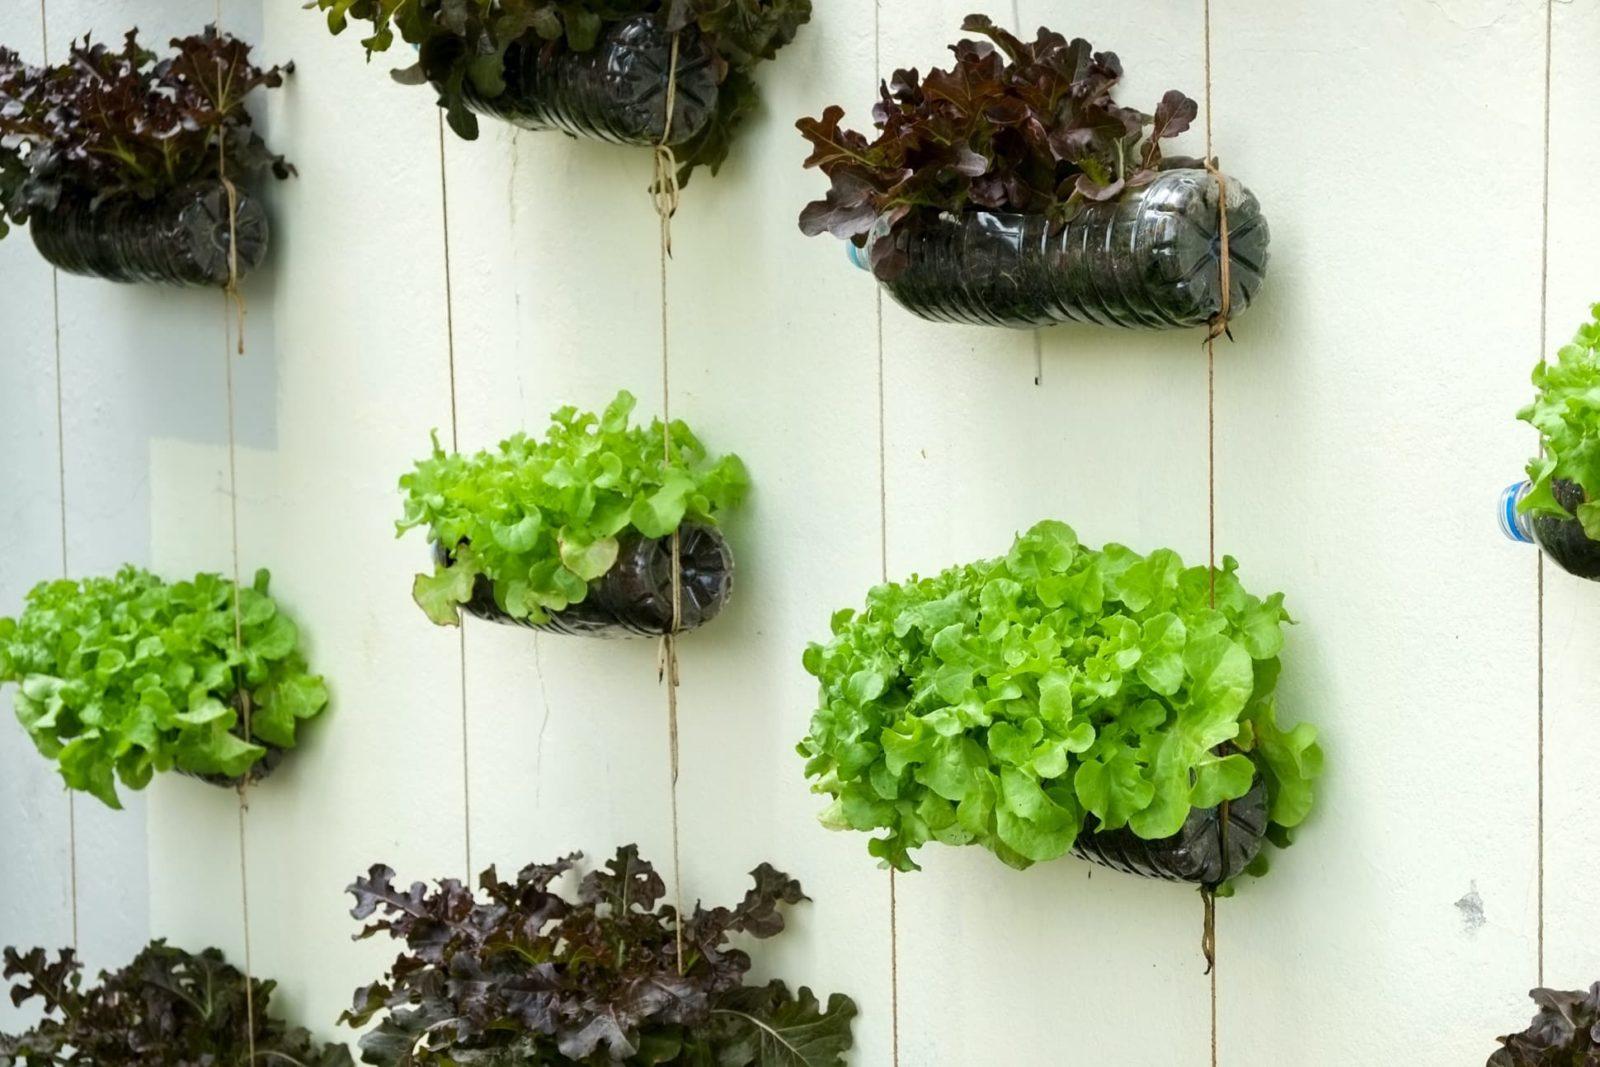 plants arranged on a wall